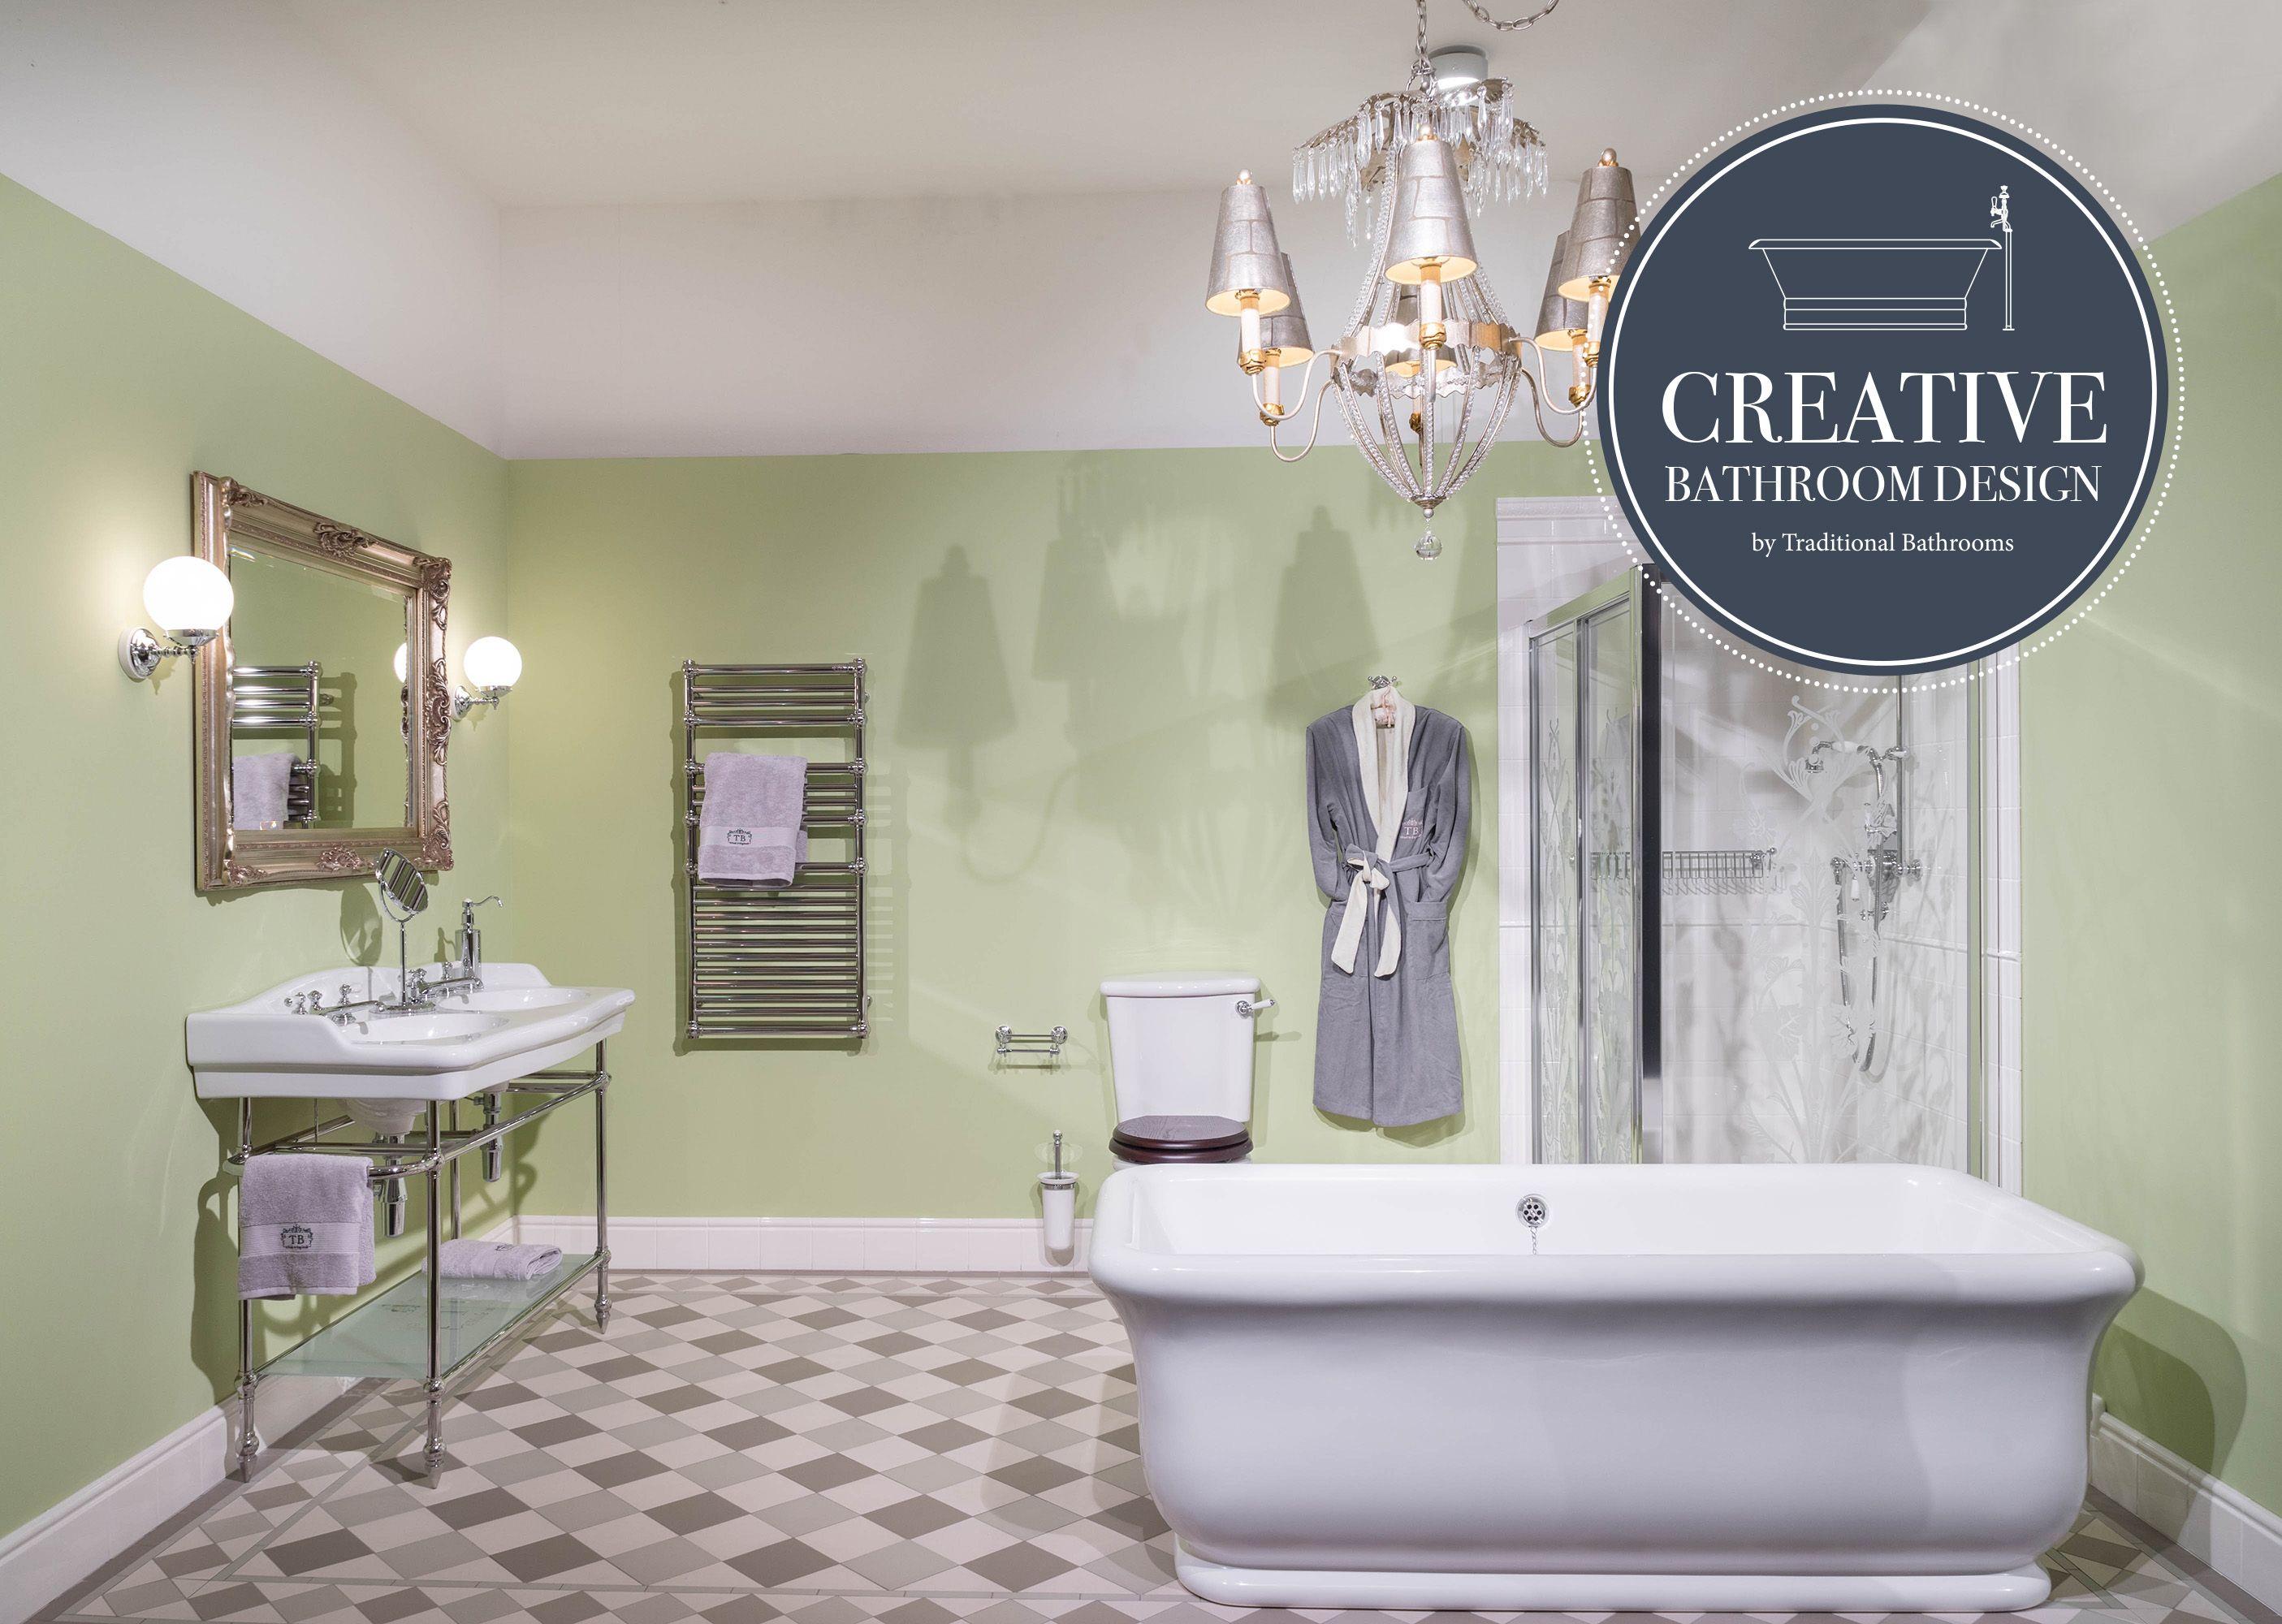 Retro Badezimmer Badezimmer Traditionelle Bader Badezimmer Design